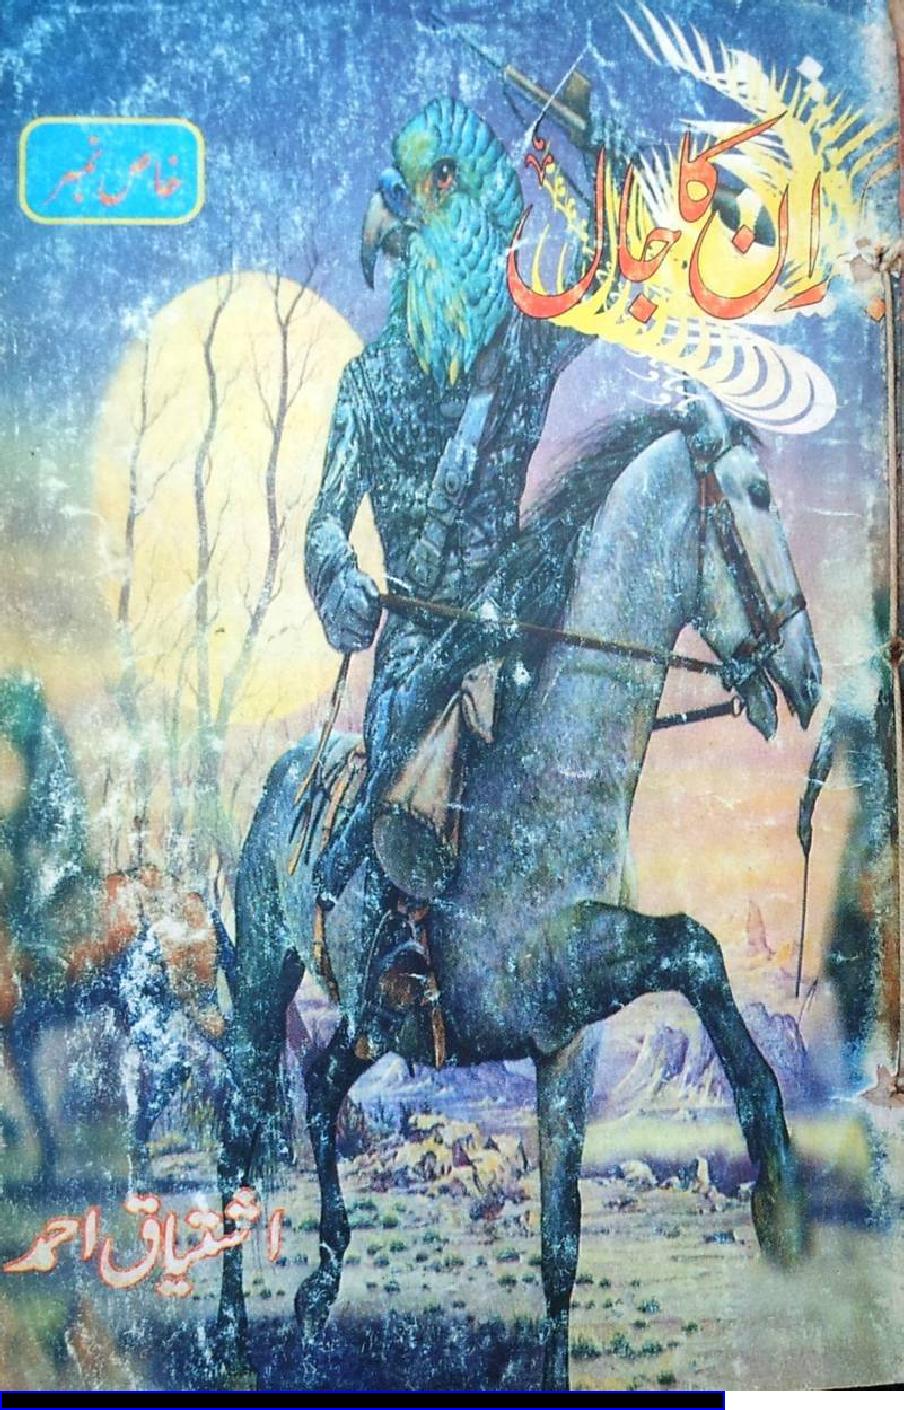 Bigran Ka Jaal Khas Number Part 2 by Ishtiaq Ahmed